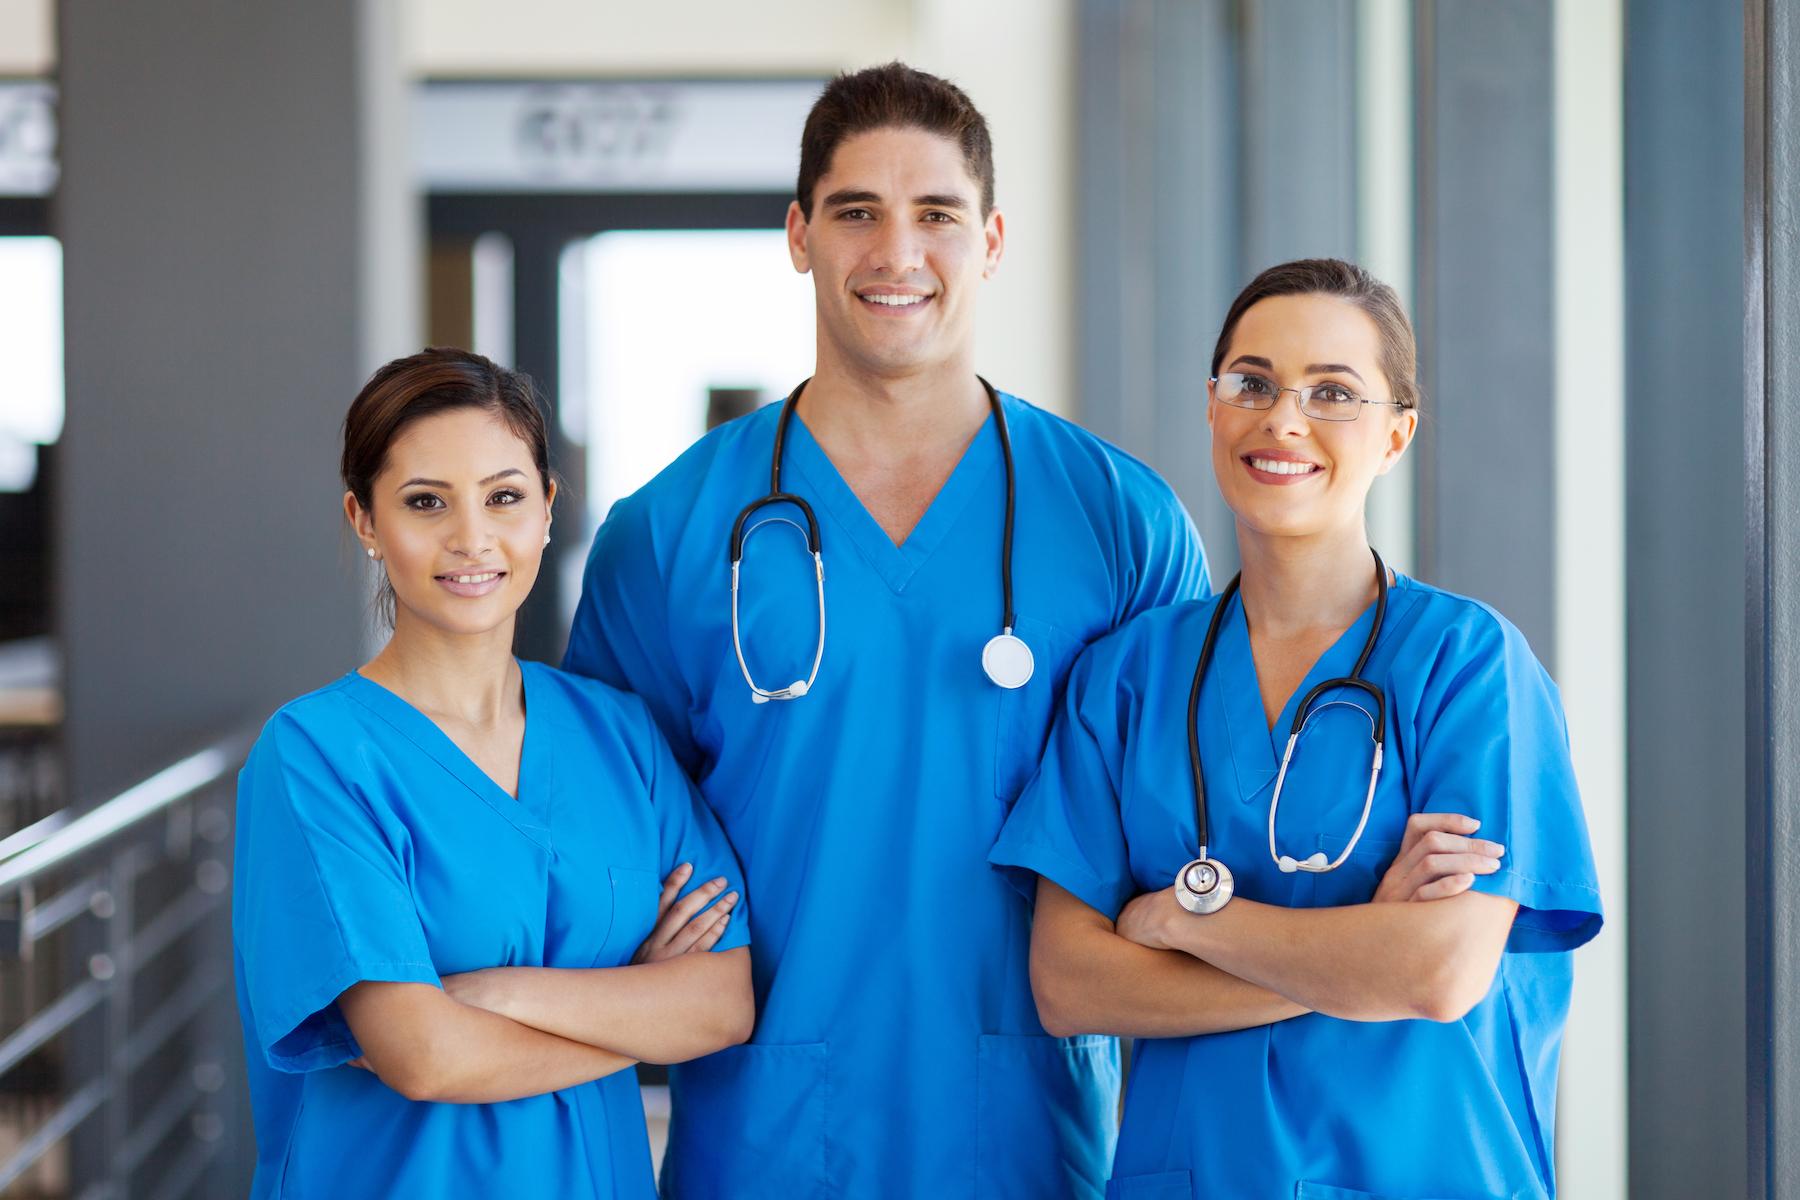 Group of nurses in hospital hallway